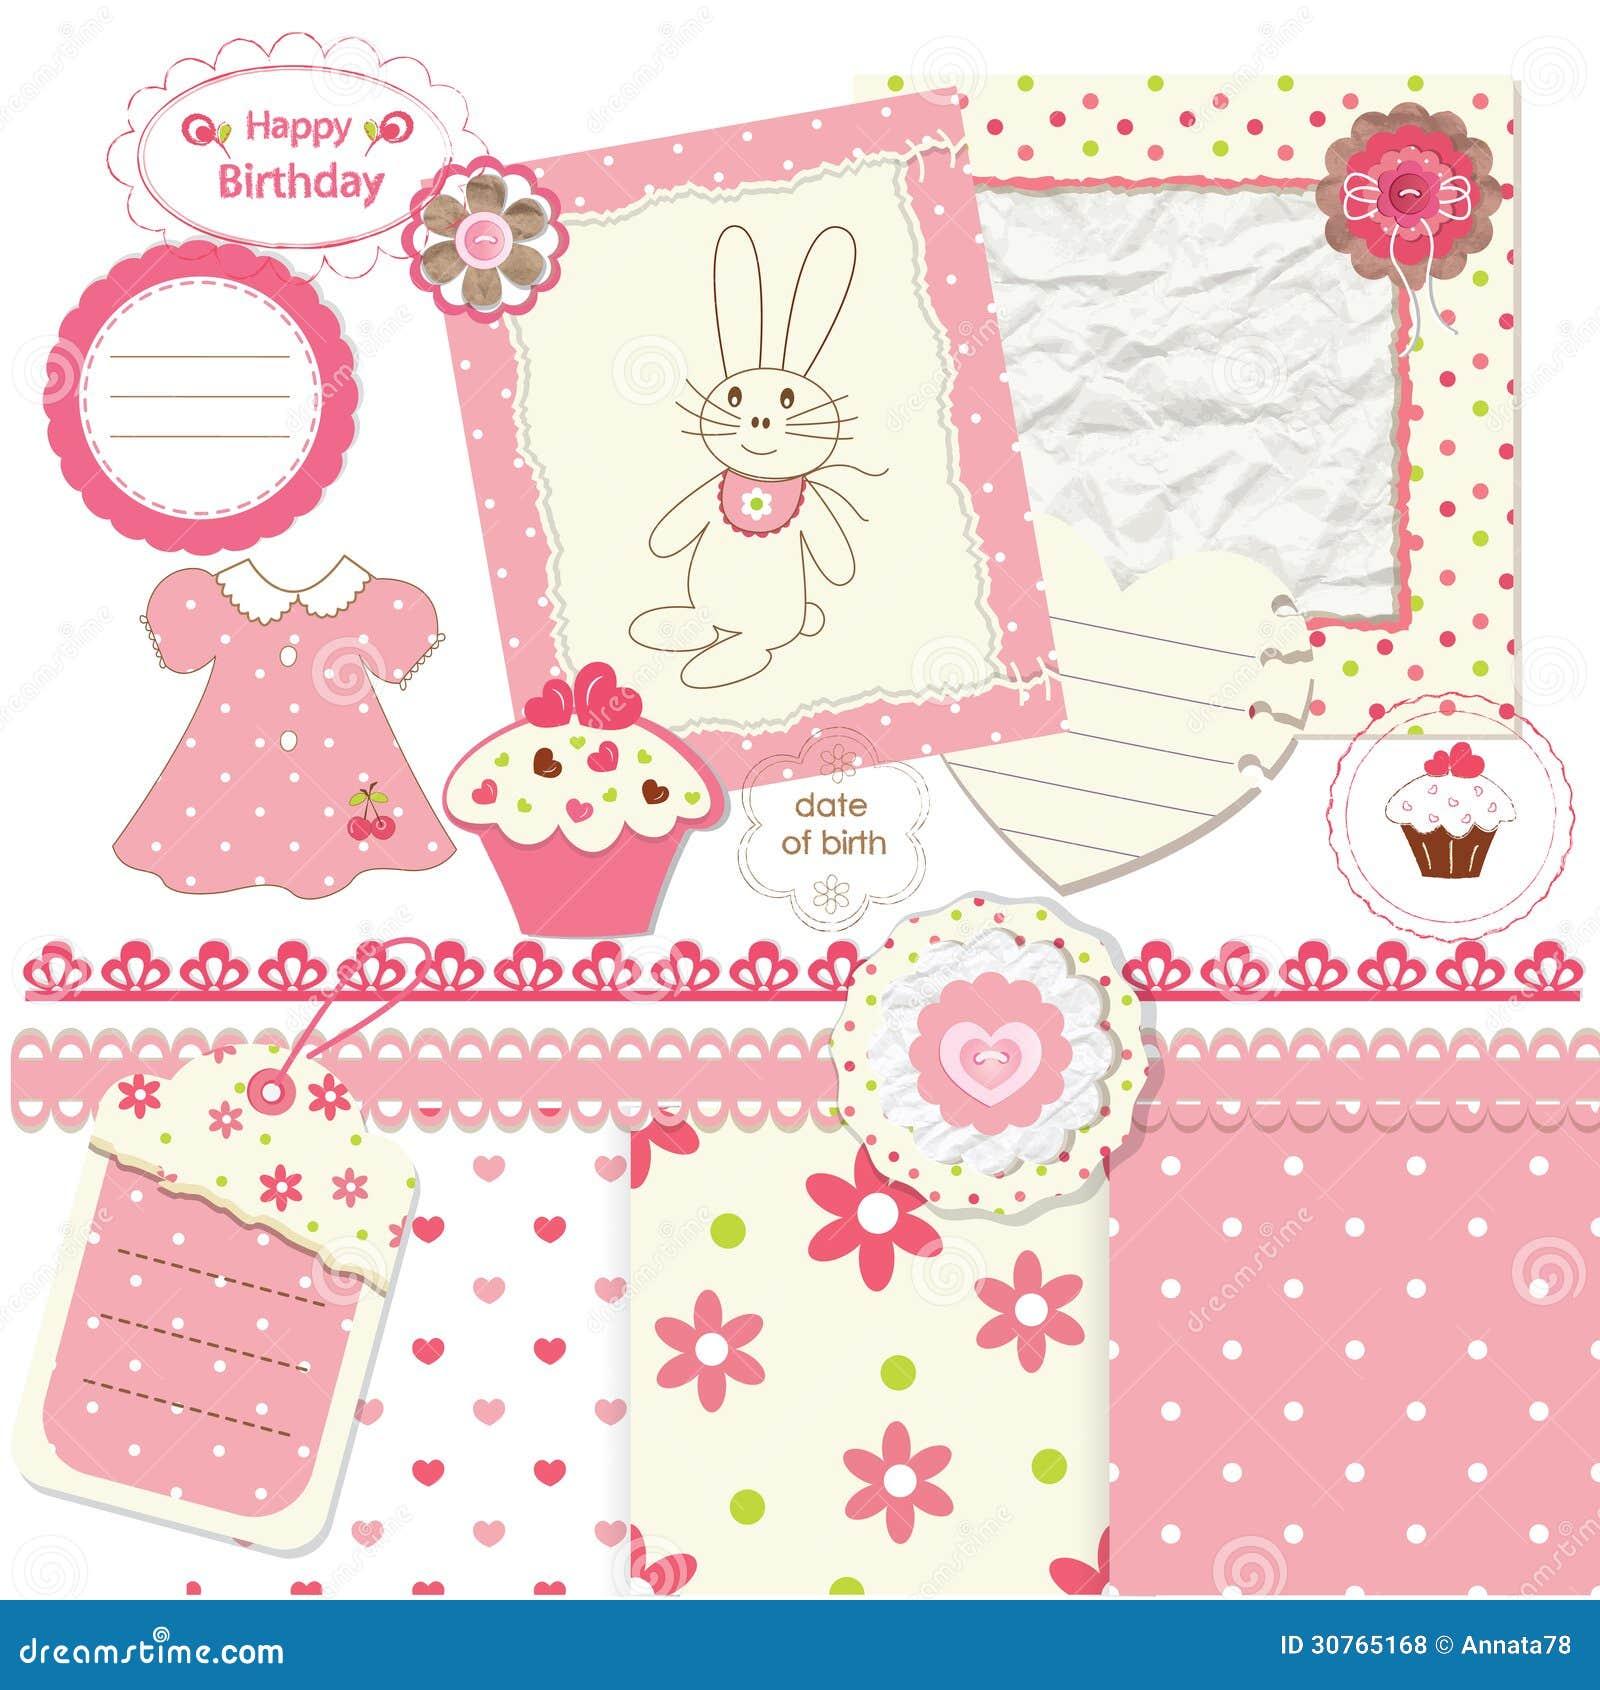 Ballerina Baby Shower Invitation as nice invitations design